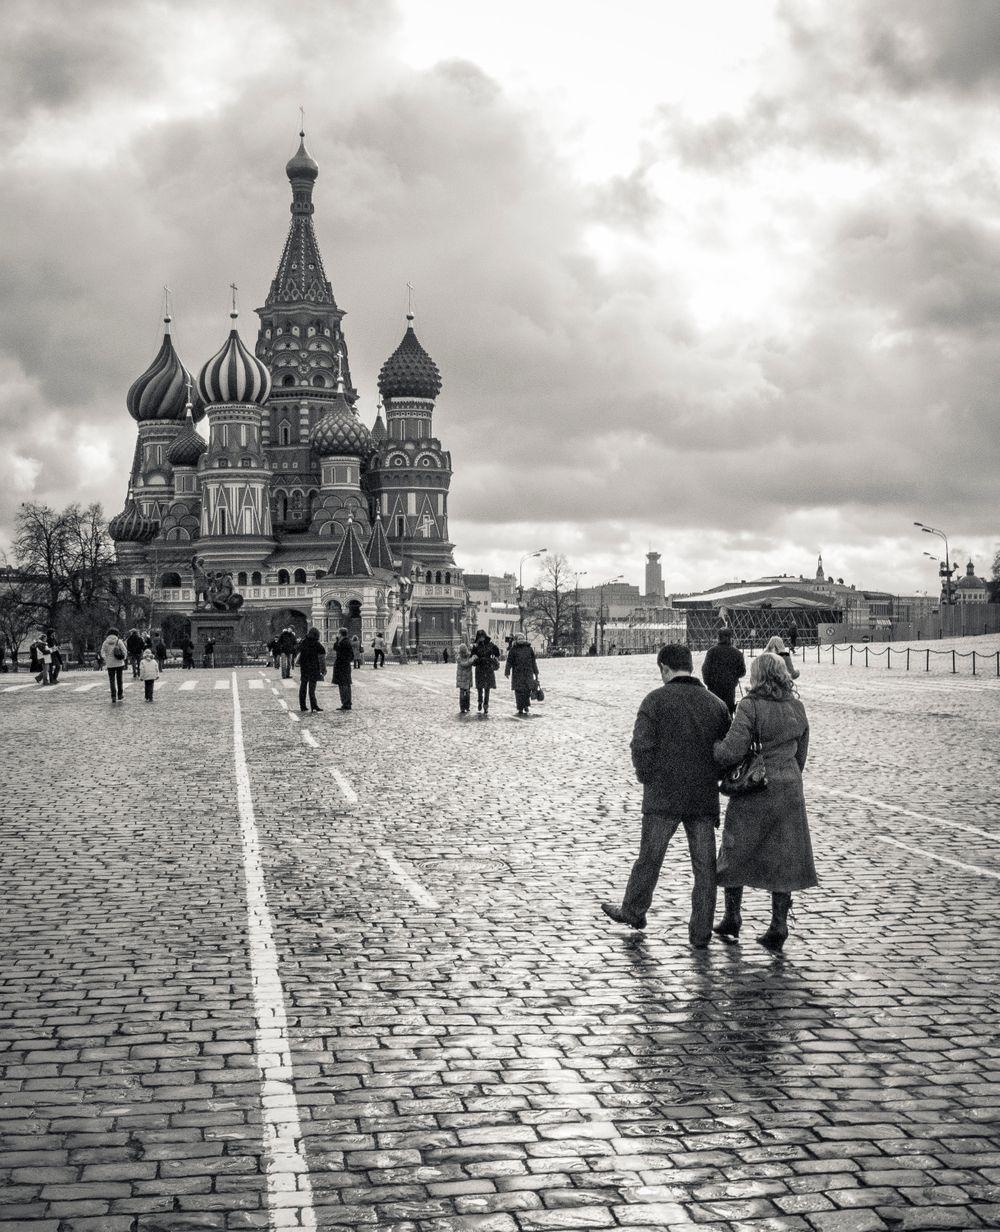 080301_Moscow -001518.JPG